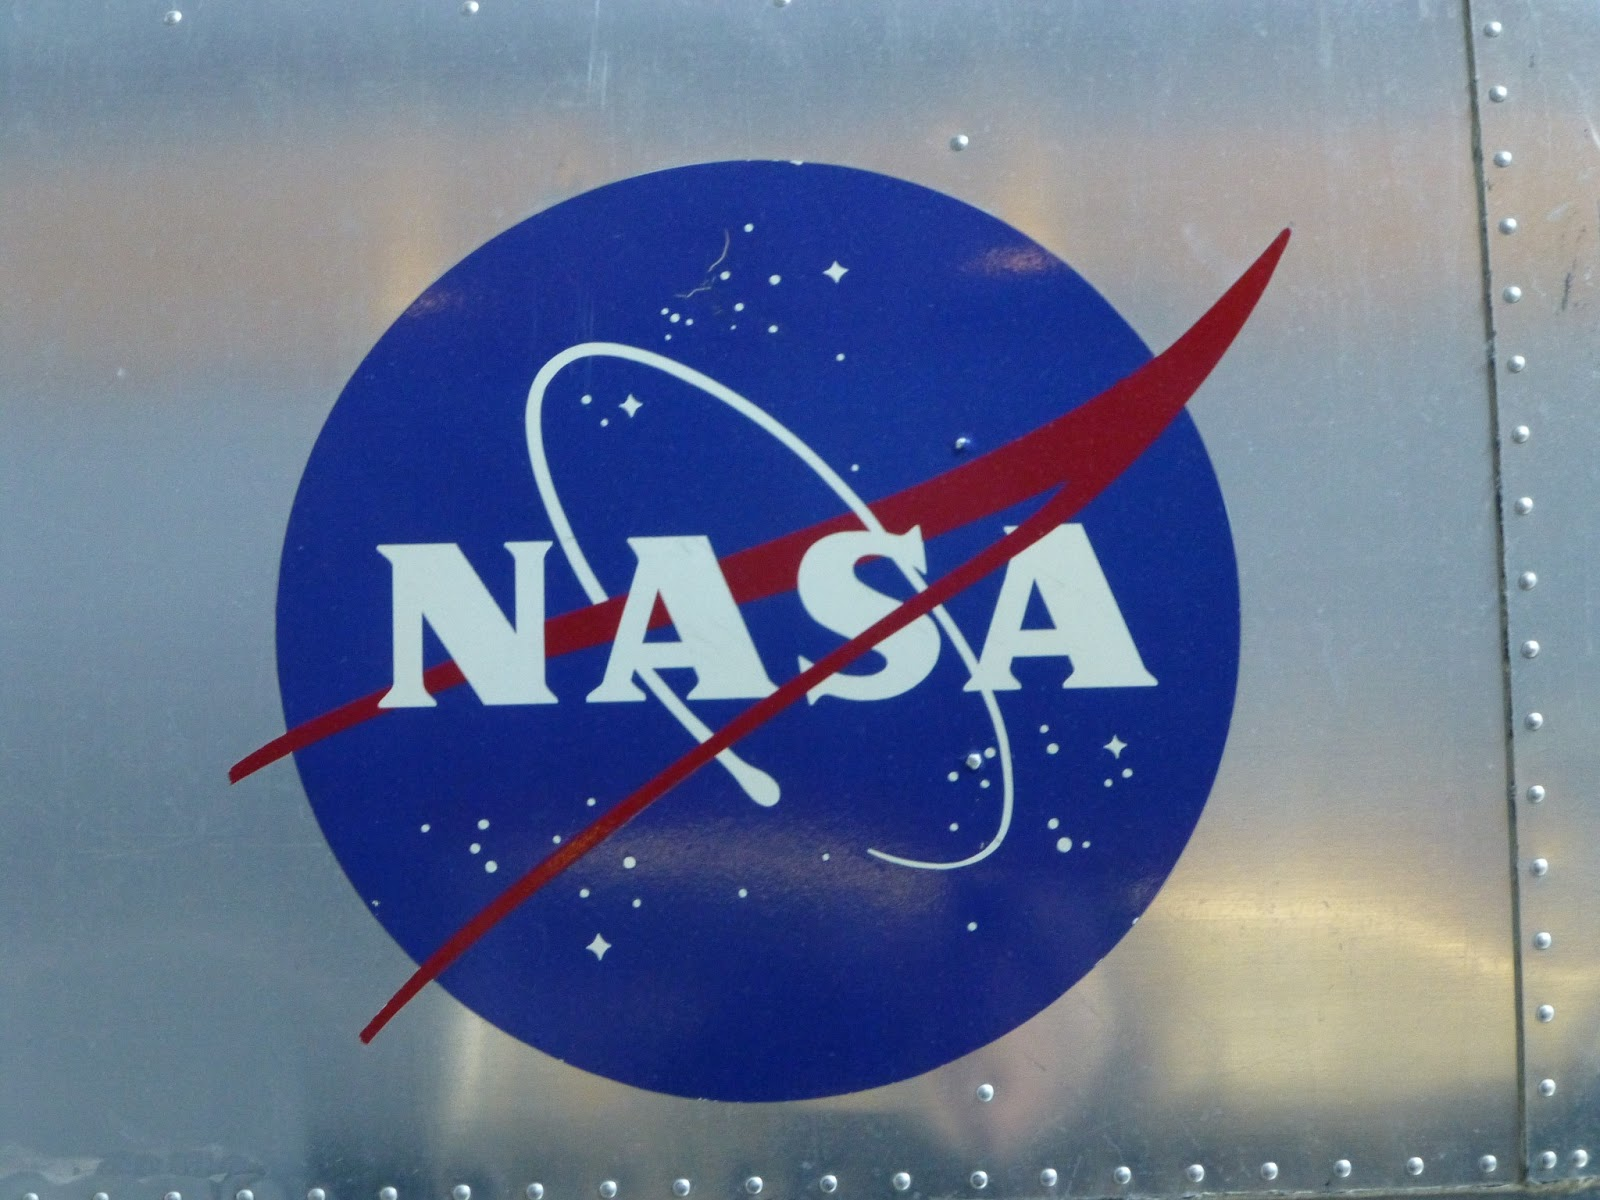 nasa department logo - photo #17